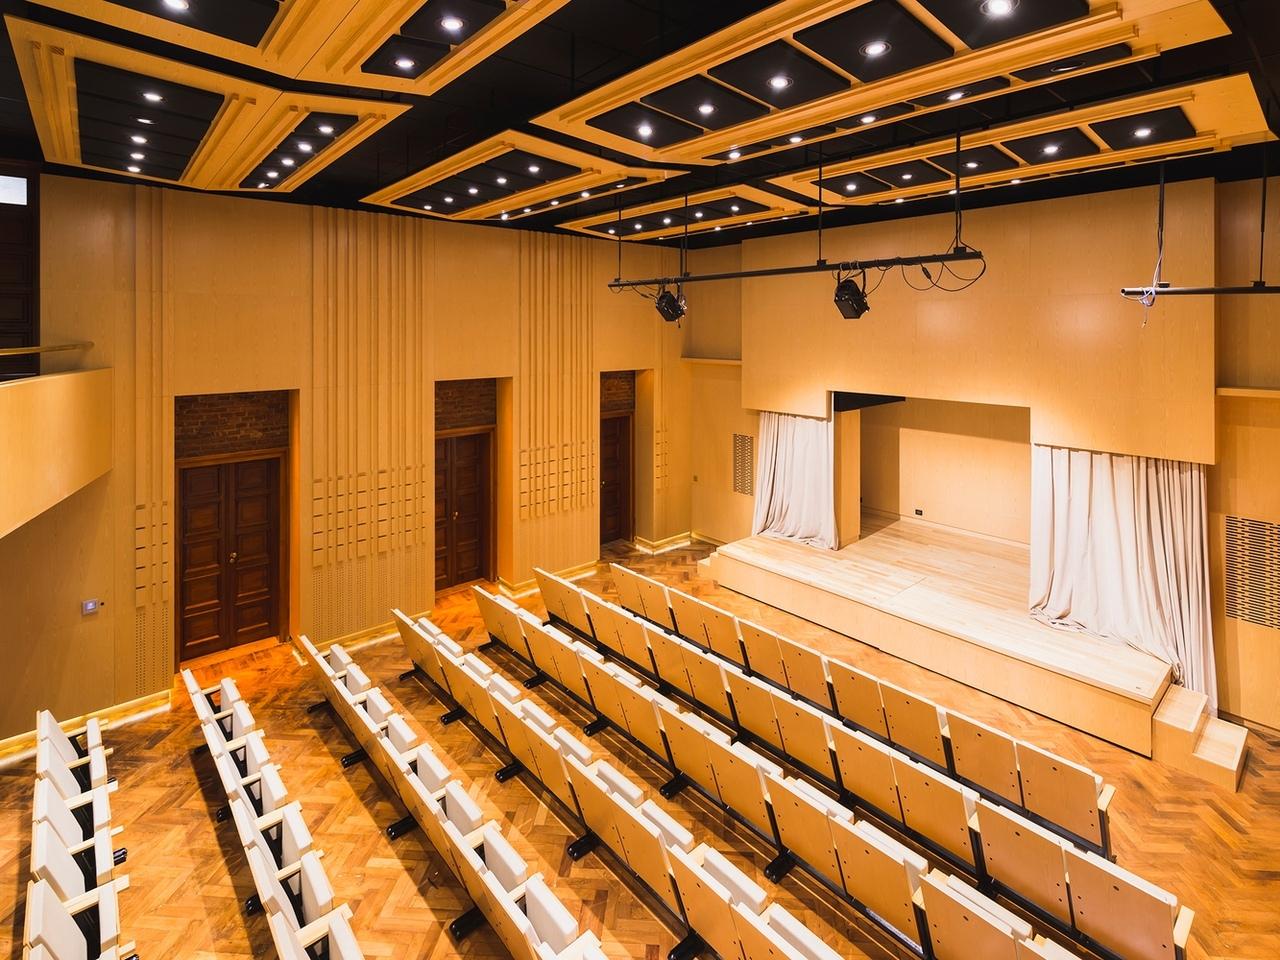 CABB Auditorium / GRHOUND OFFICE